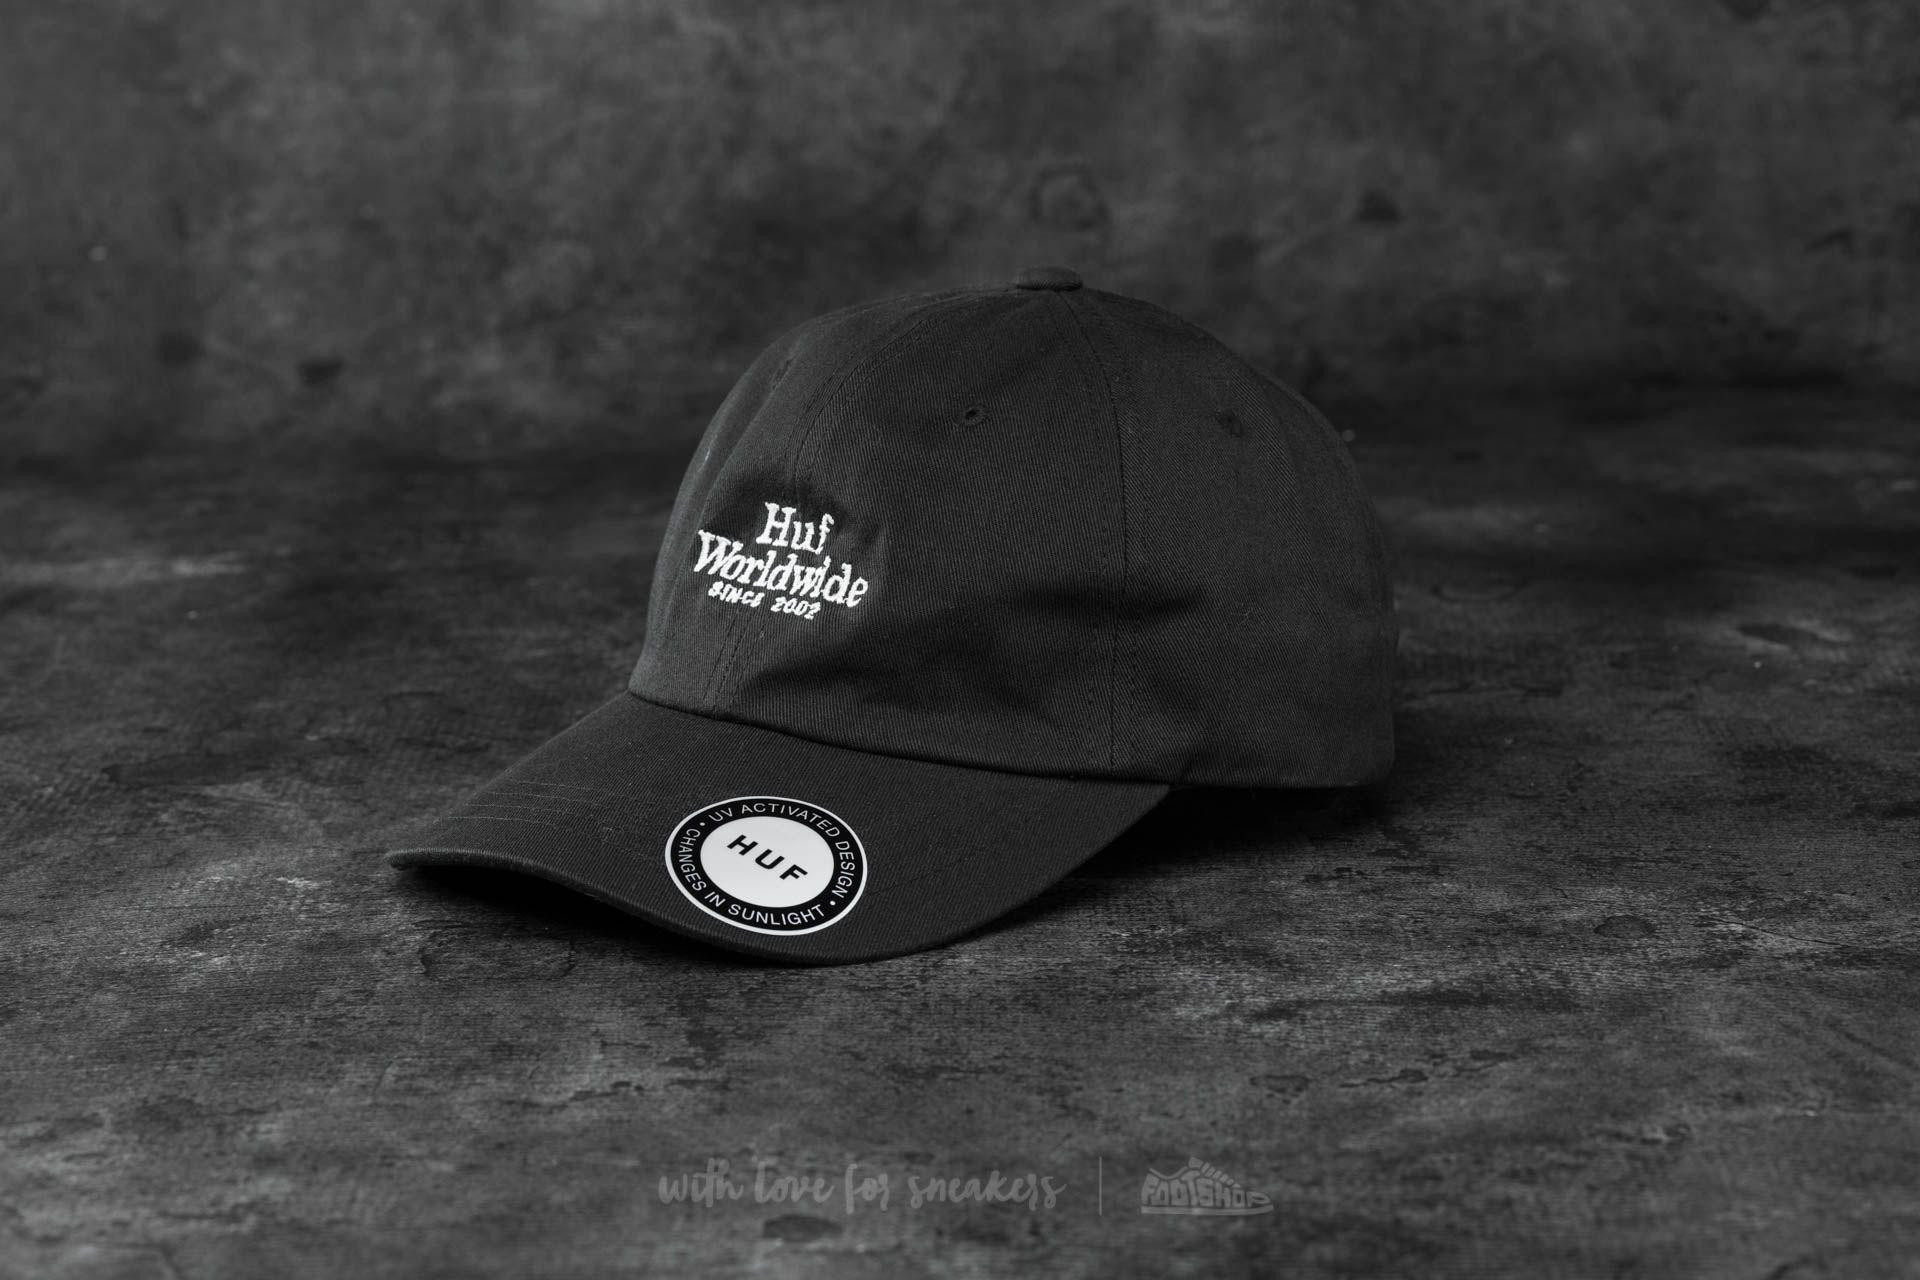 056910e6074 HUF Apparel Worldwide UV Curved Brim Hat Black